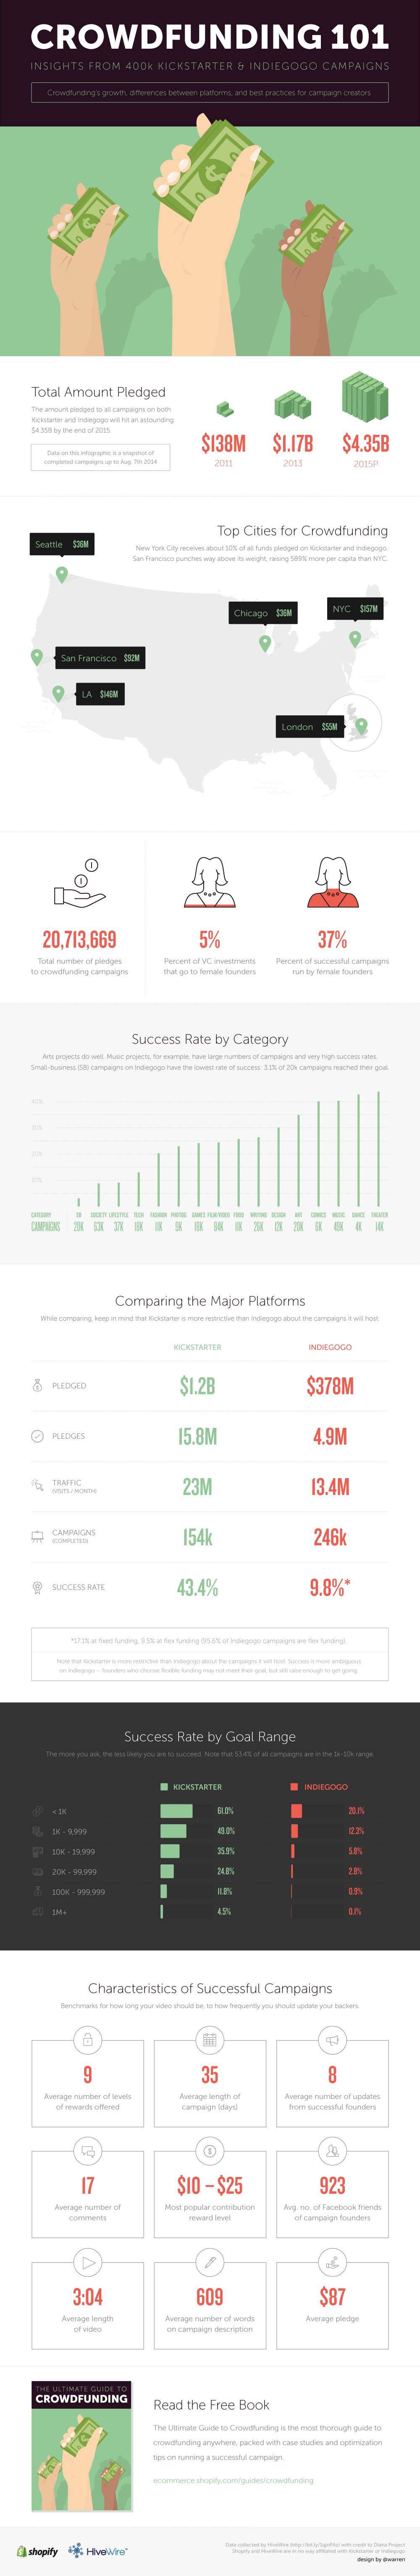 crowdfunding-infographic